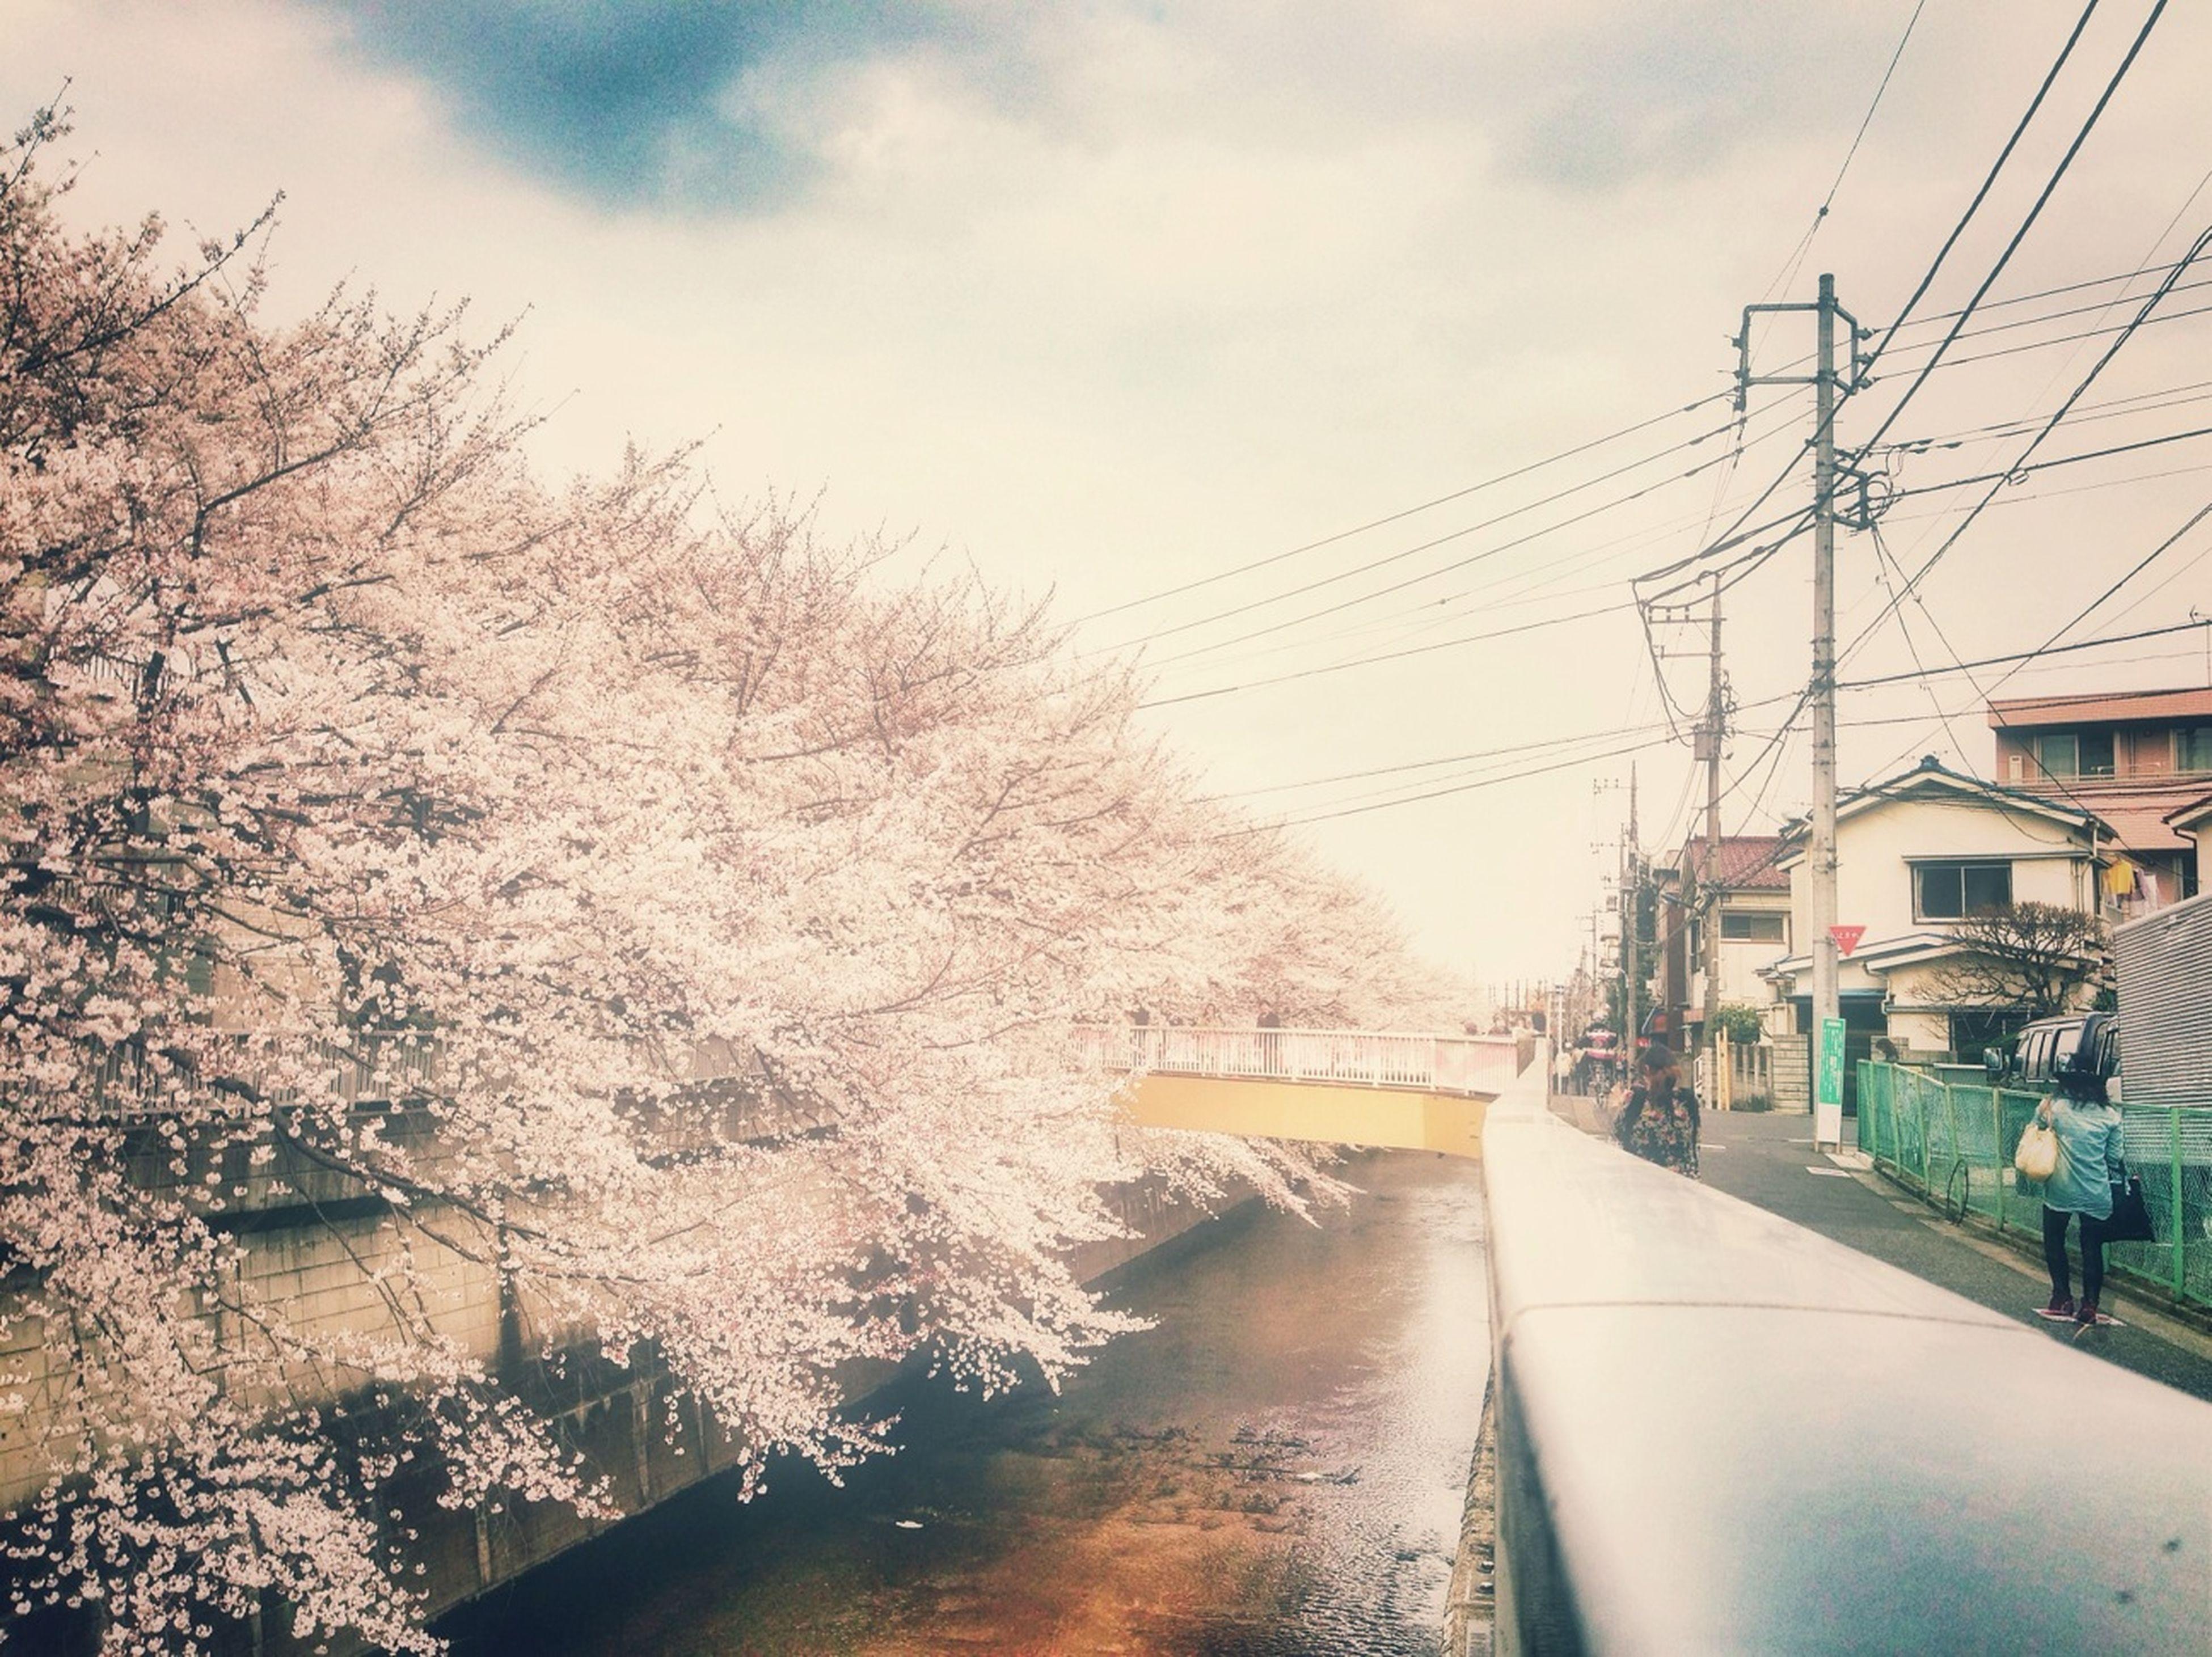 Spring Sakura Cherry Blossoms Great Views